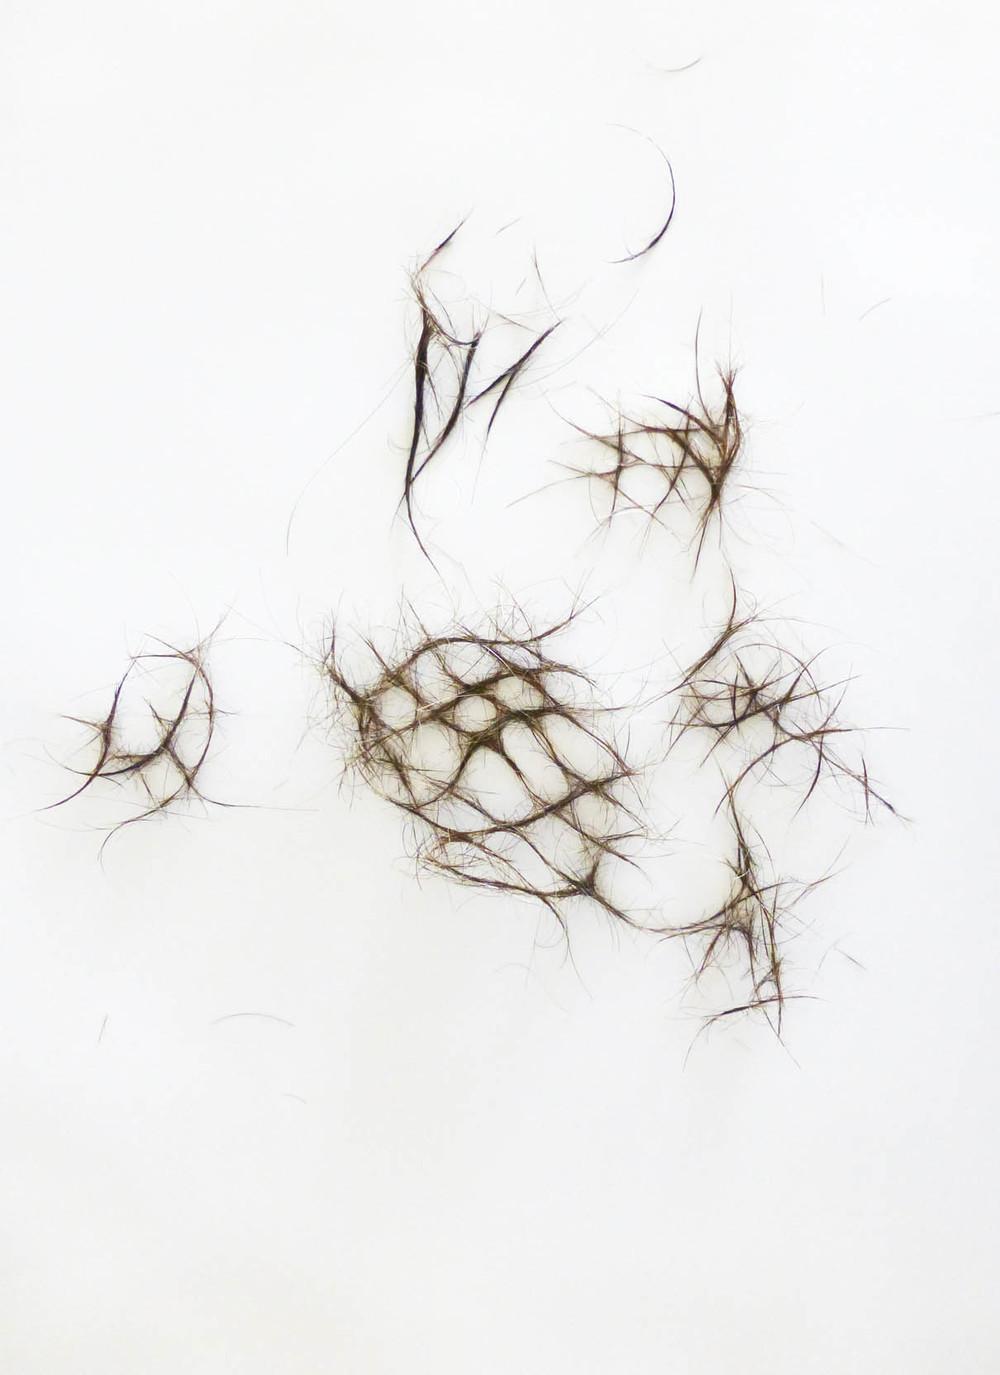 Lara Mumby-Croft, 2013. Hair Net, Degrade. (Digital photograph). Collection of the artist.